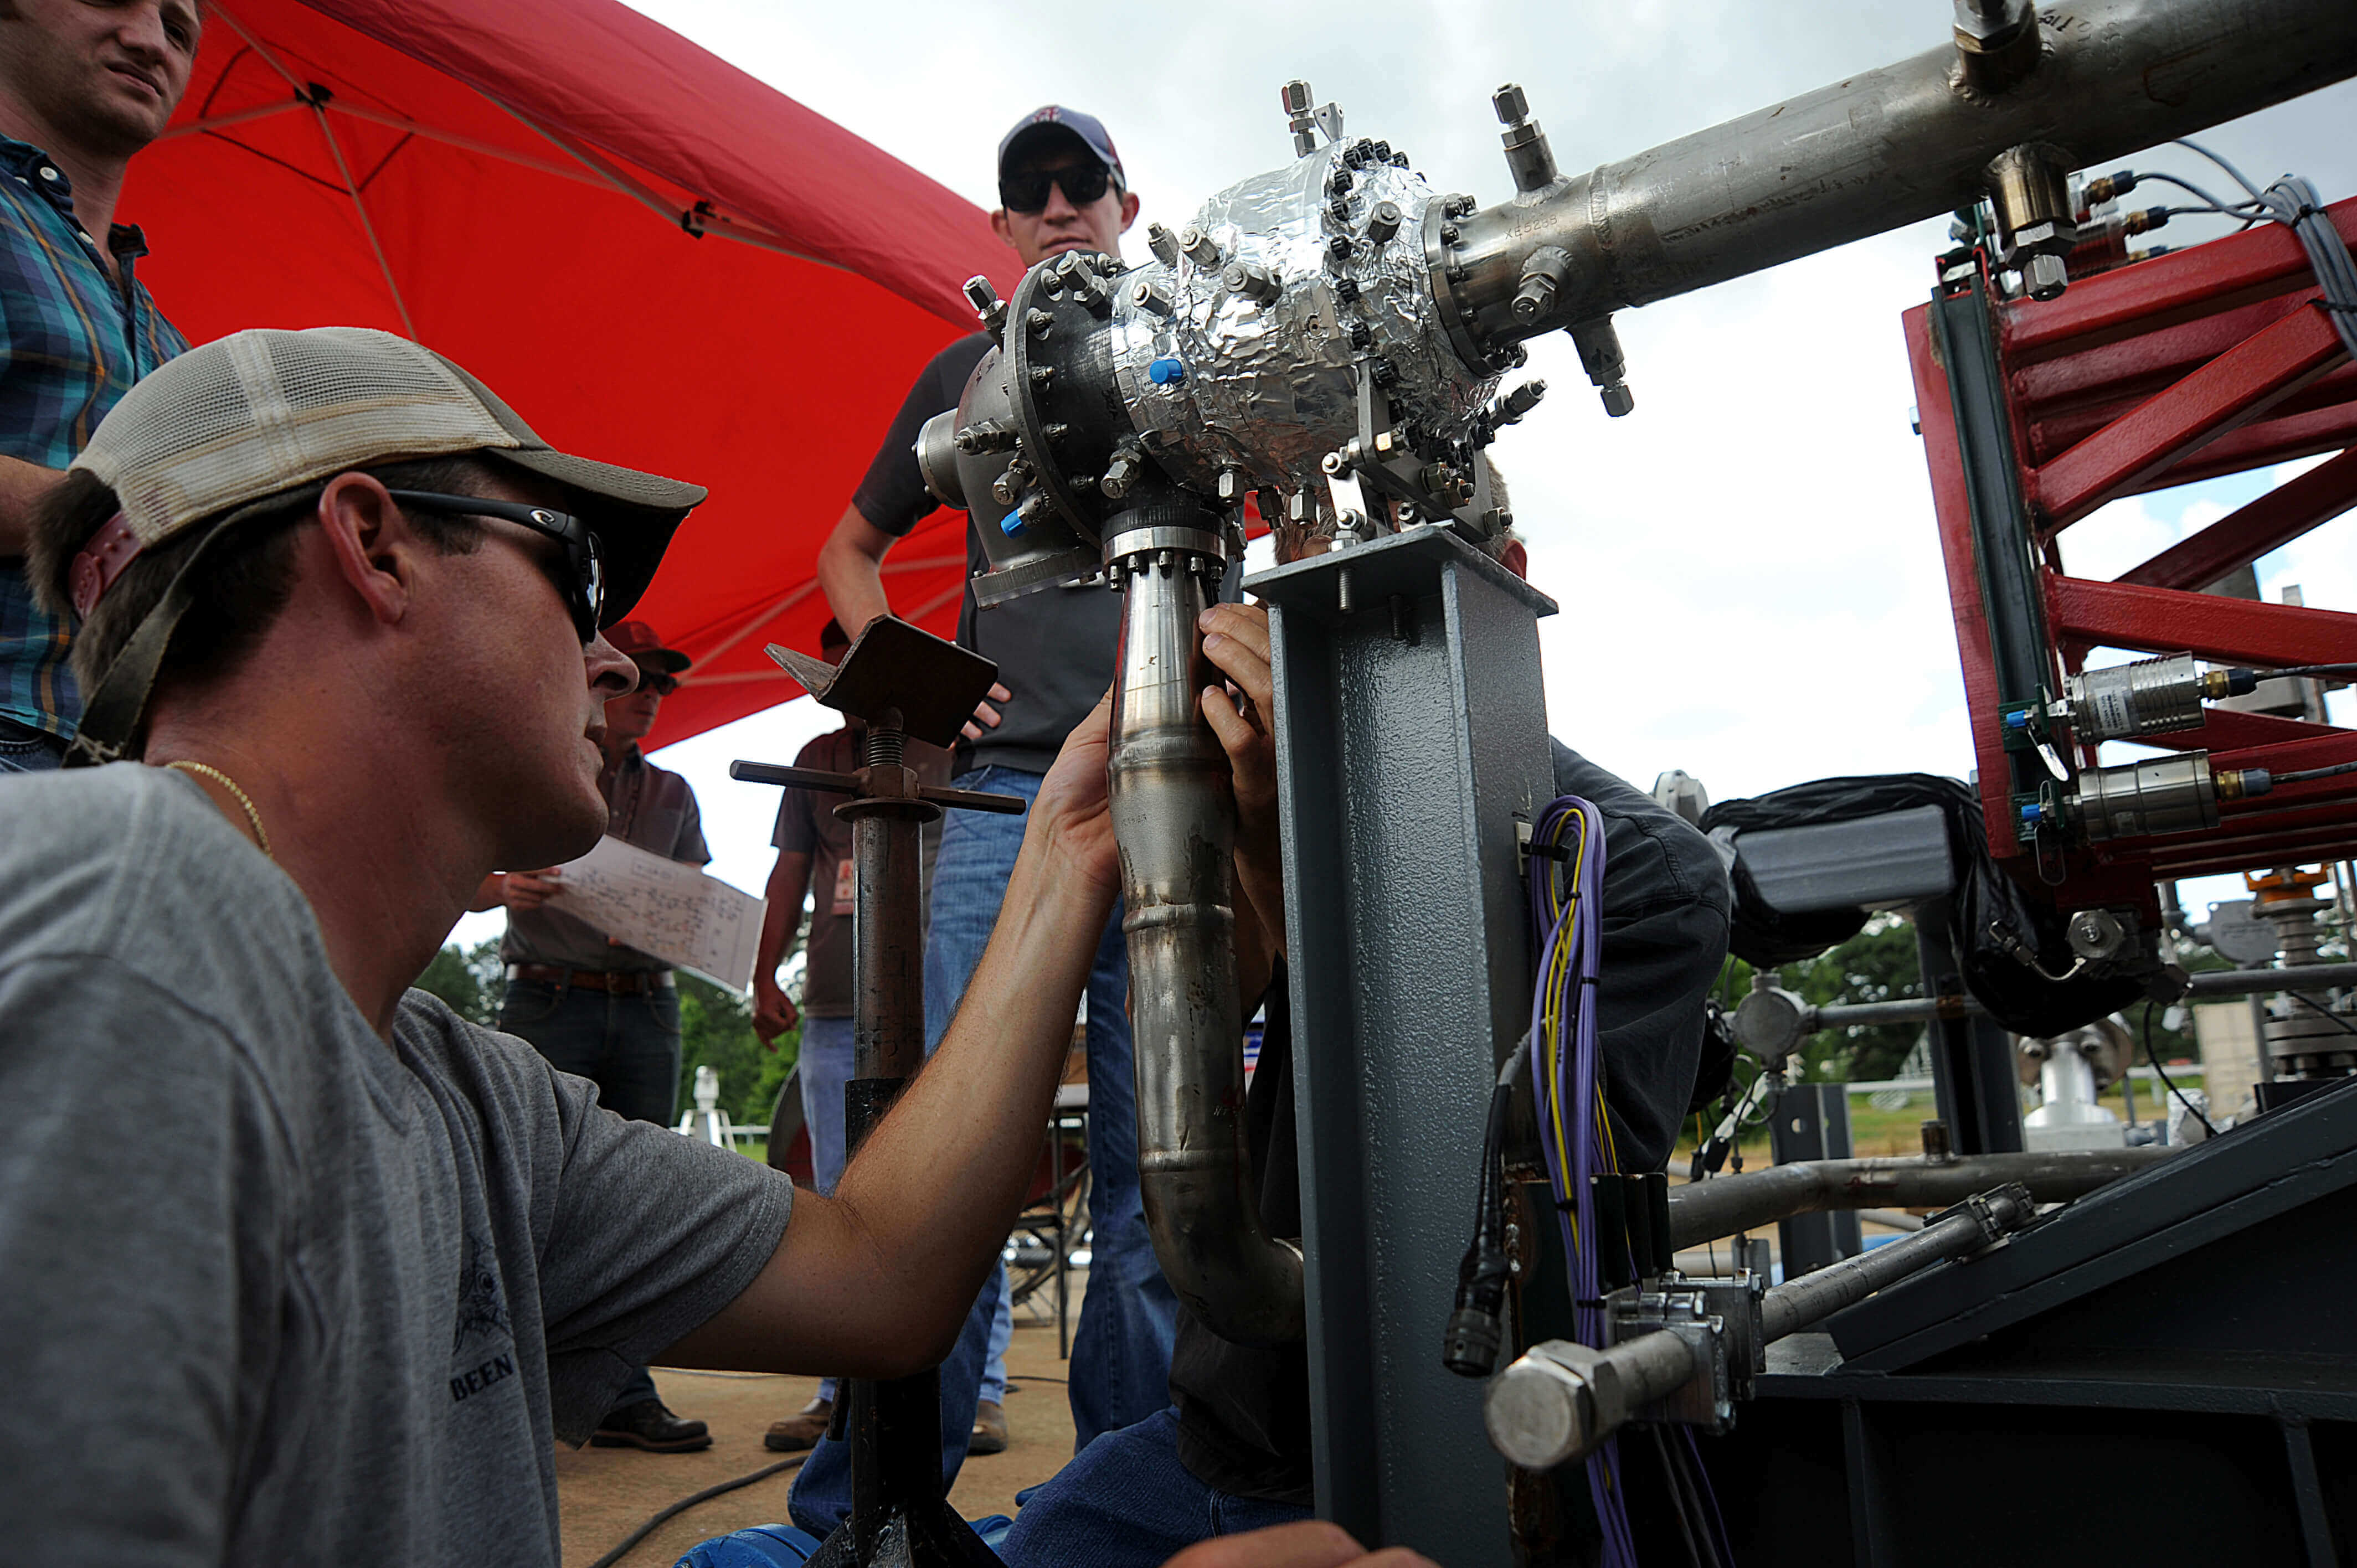 NASA Builds 3D Printed Turbopump Capable of 2,000 HP | All3DP